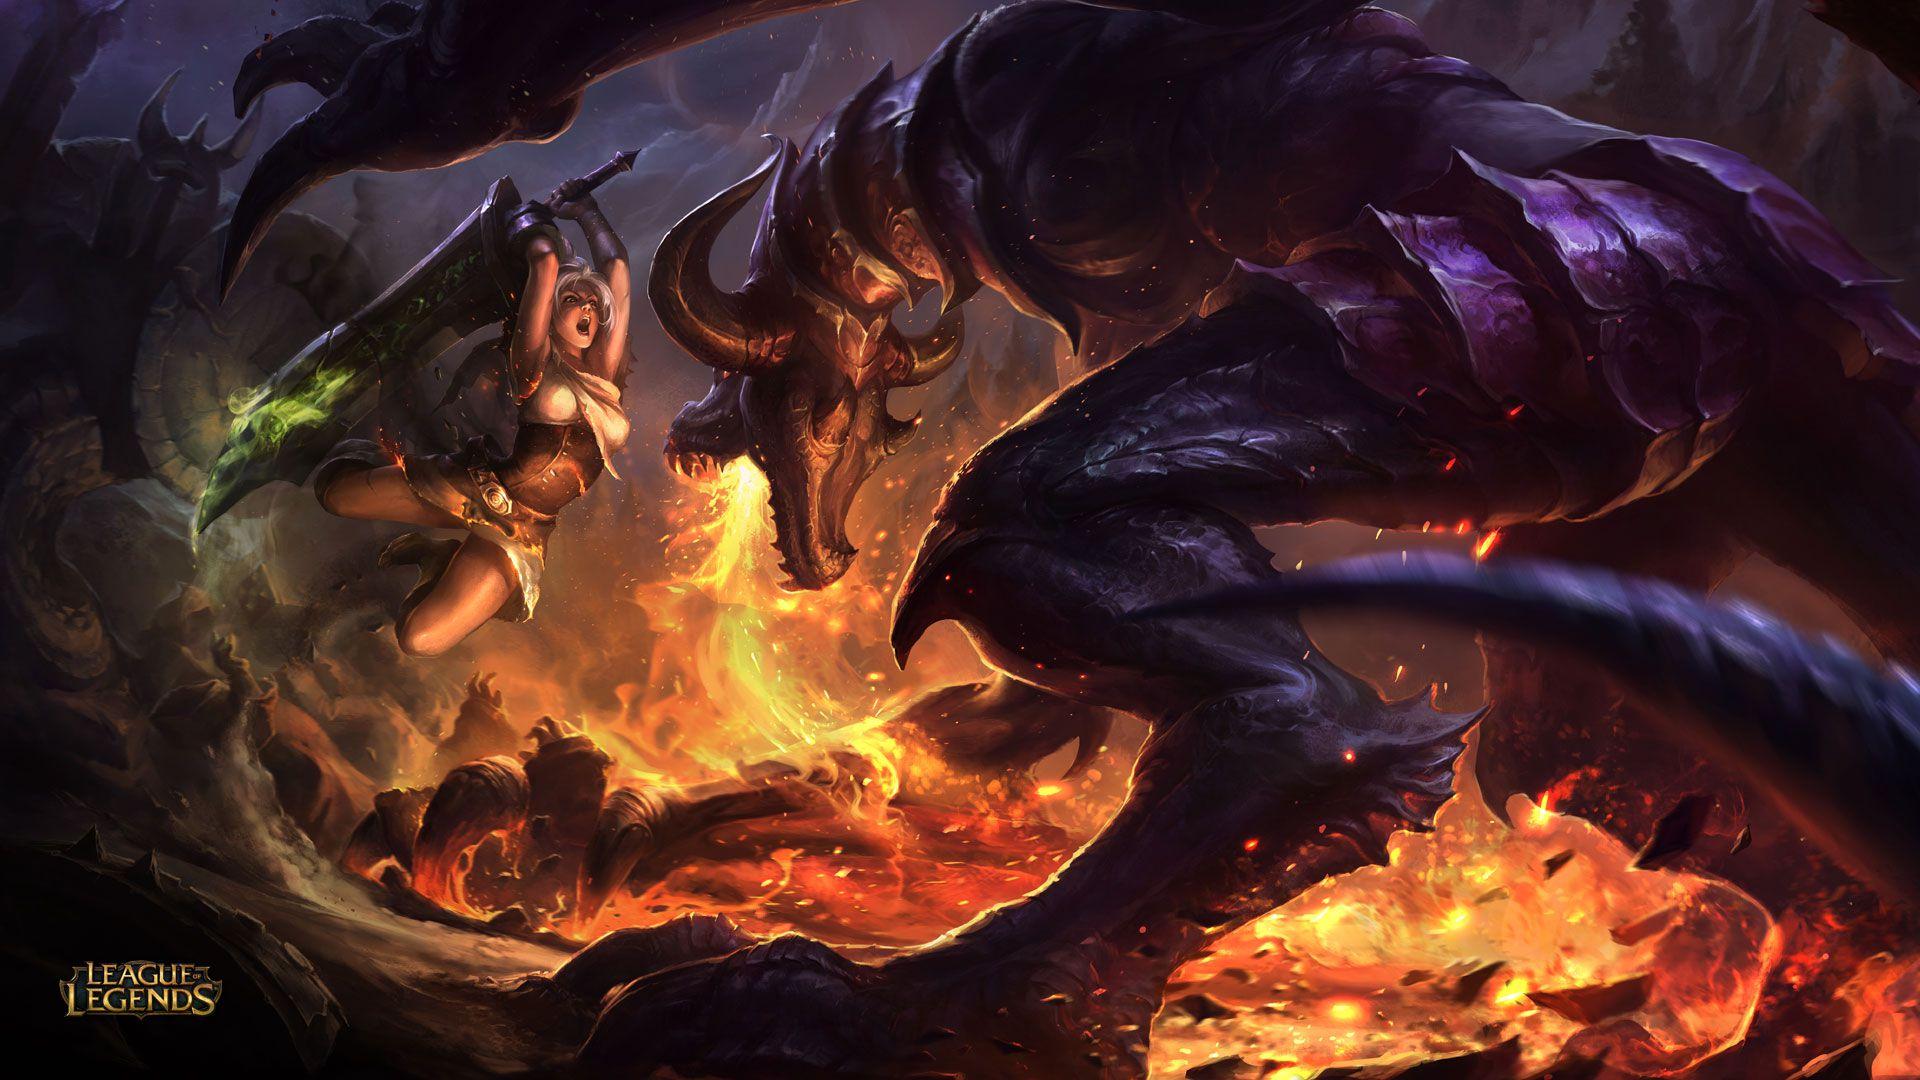 Riven vs Shyvana - League of Legends Wallpapers